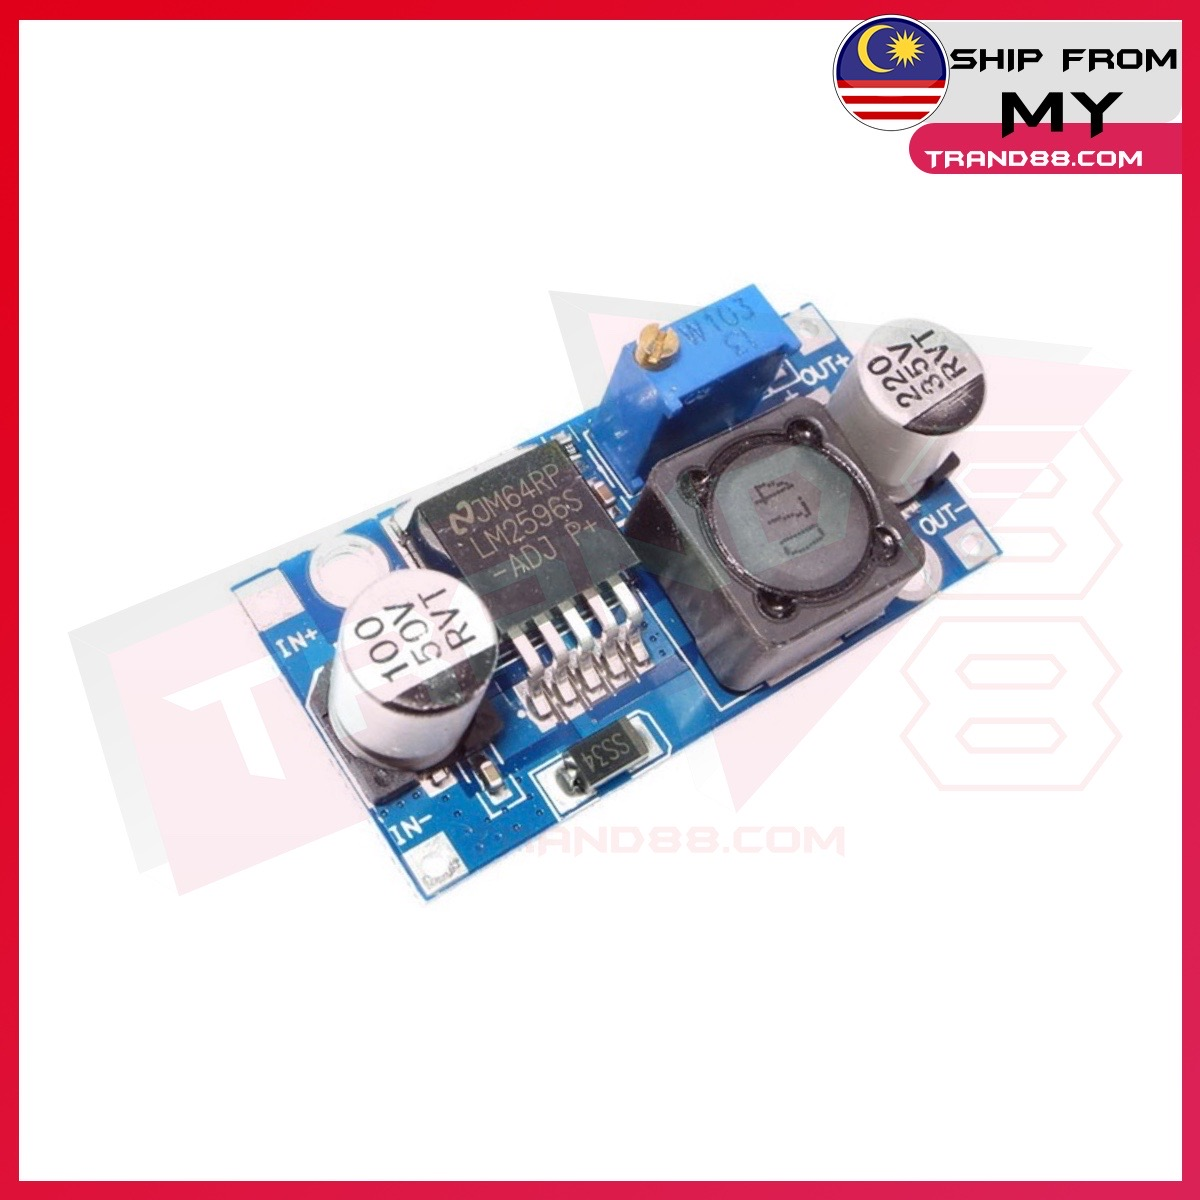 LM2596 LM2596S ADJ Power supply module DC-DC Step-down module adjustable Voltage regulator 3A